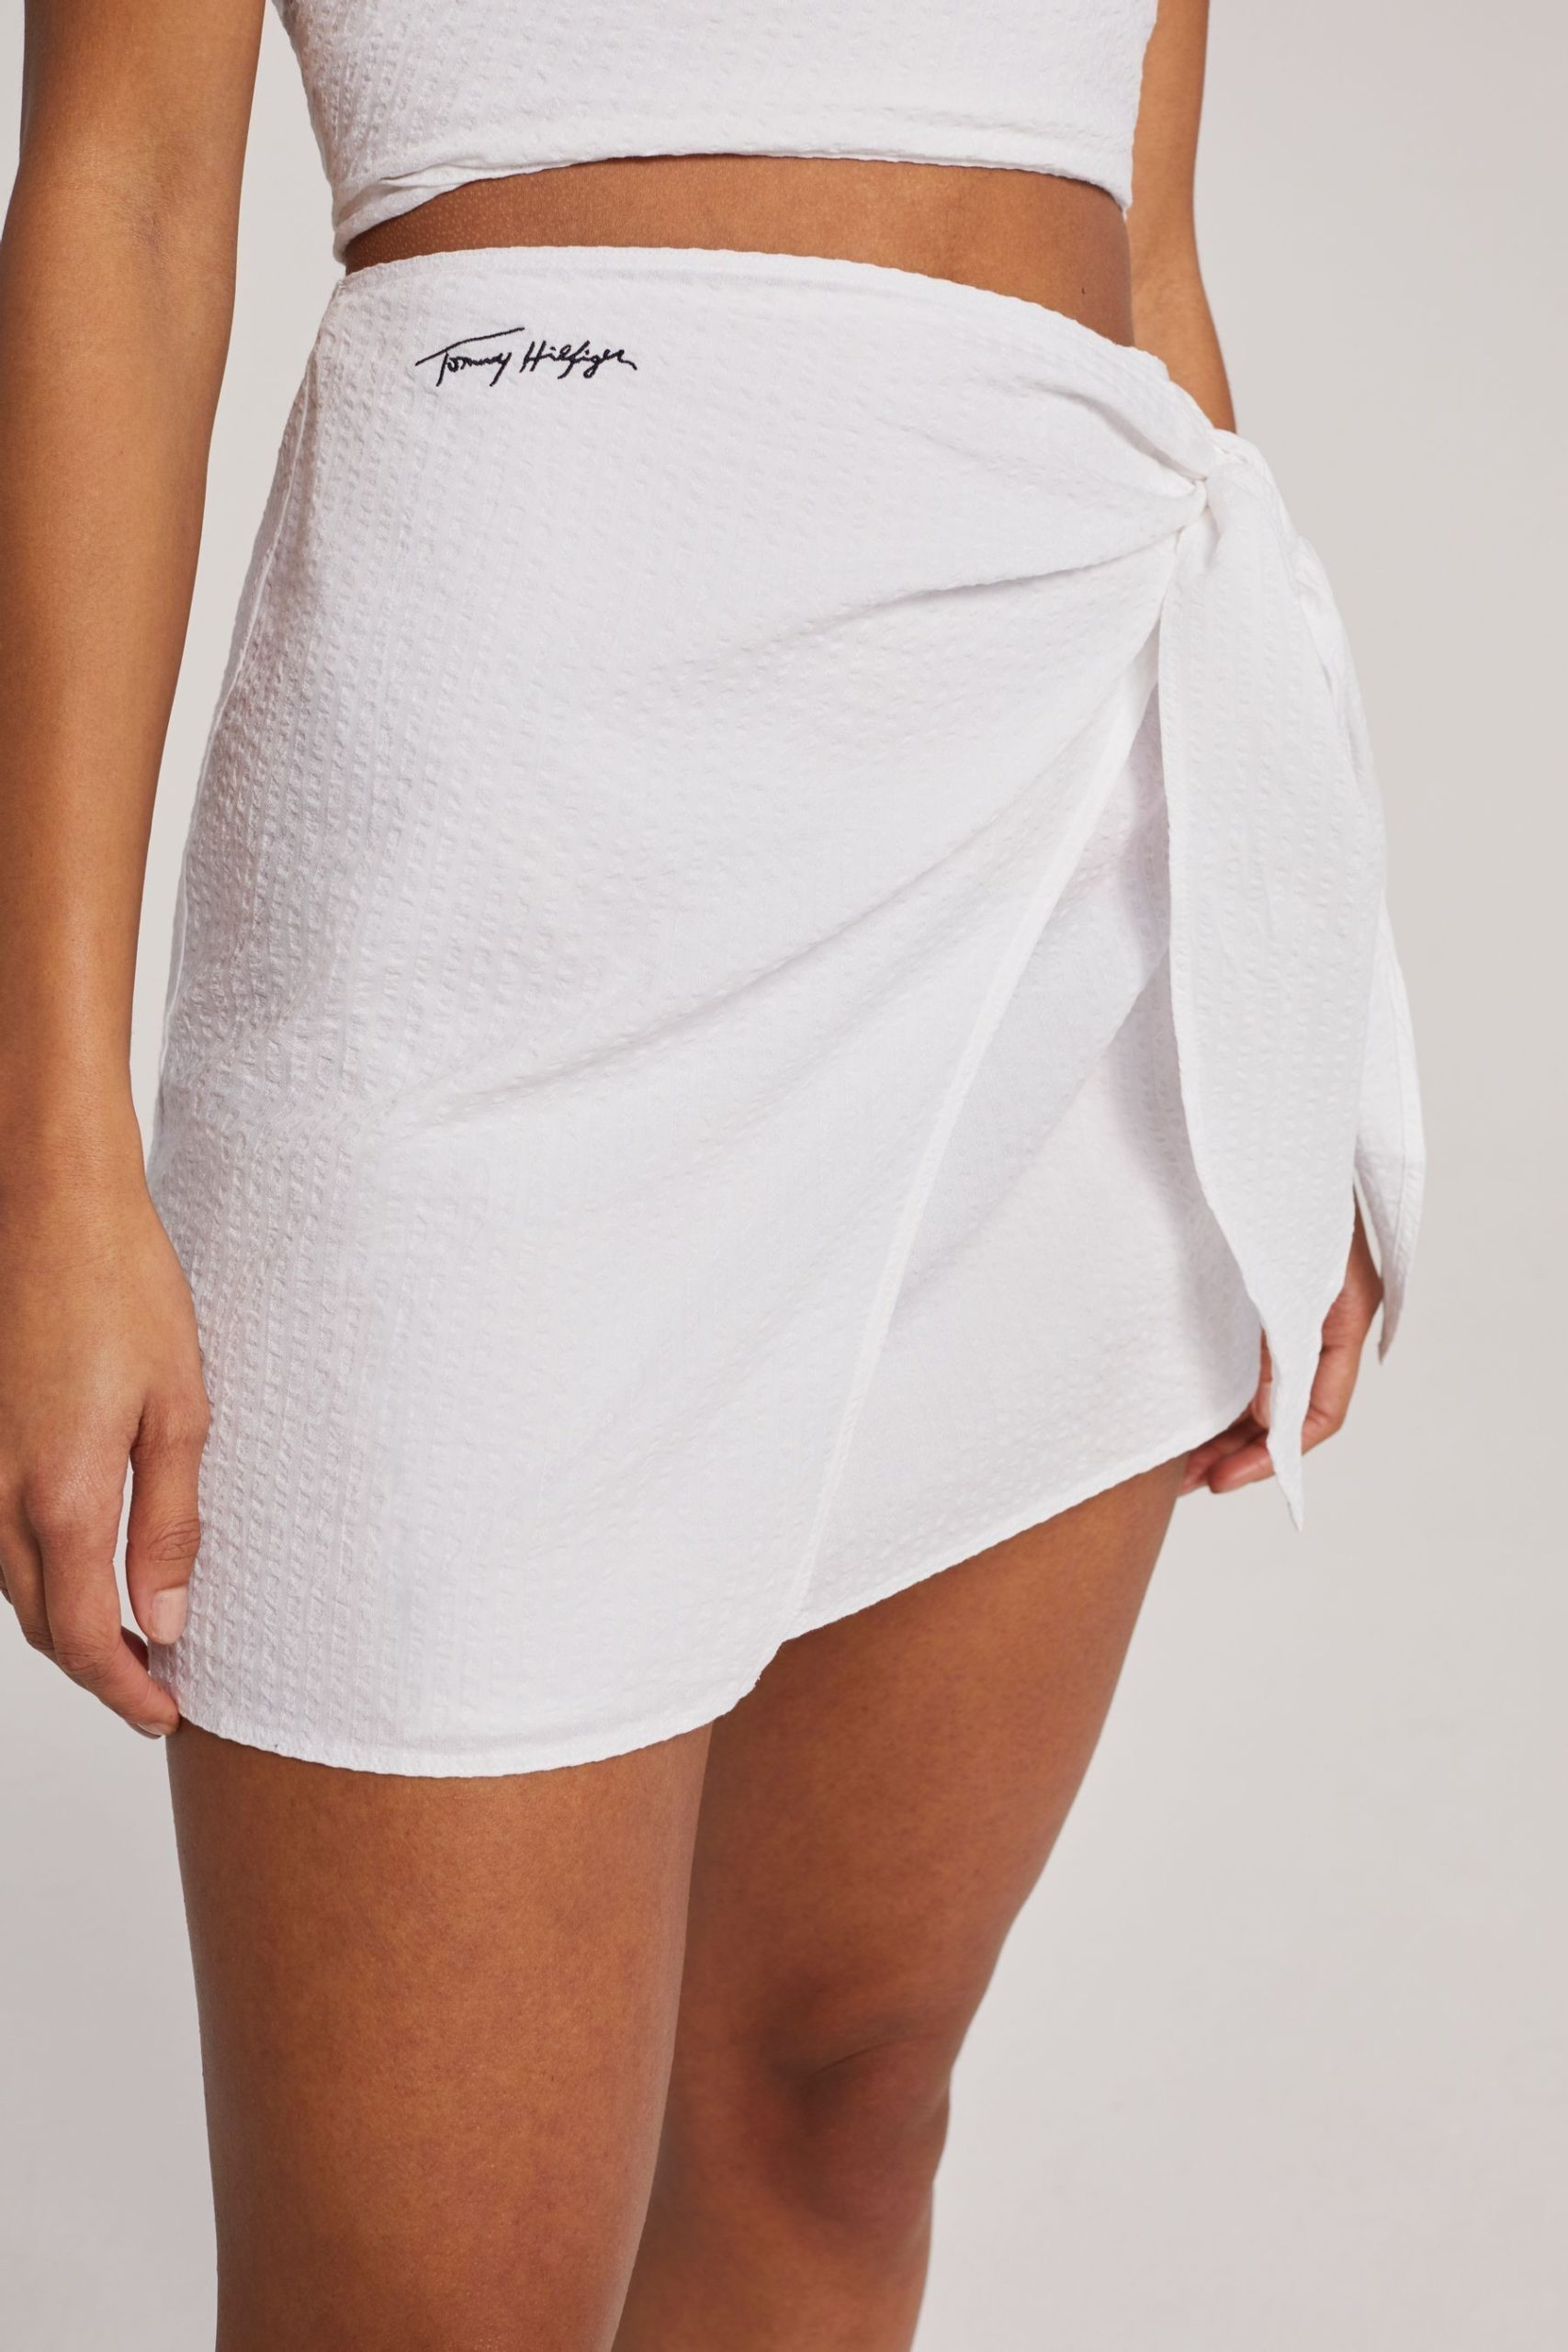 Tommy Hilfiger White Beach Club Skirt